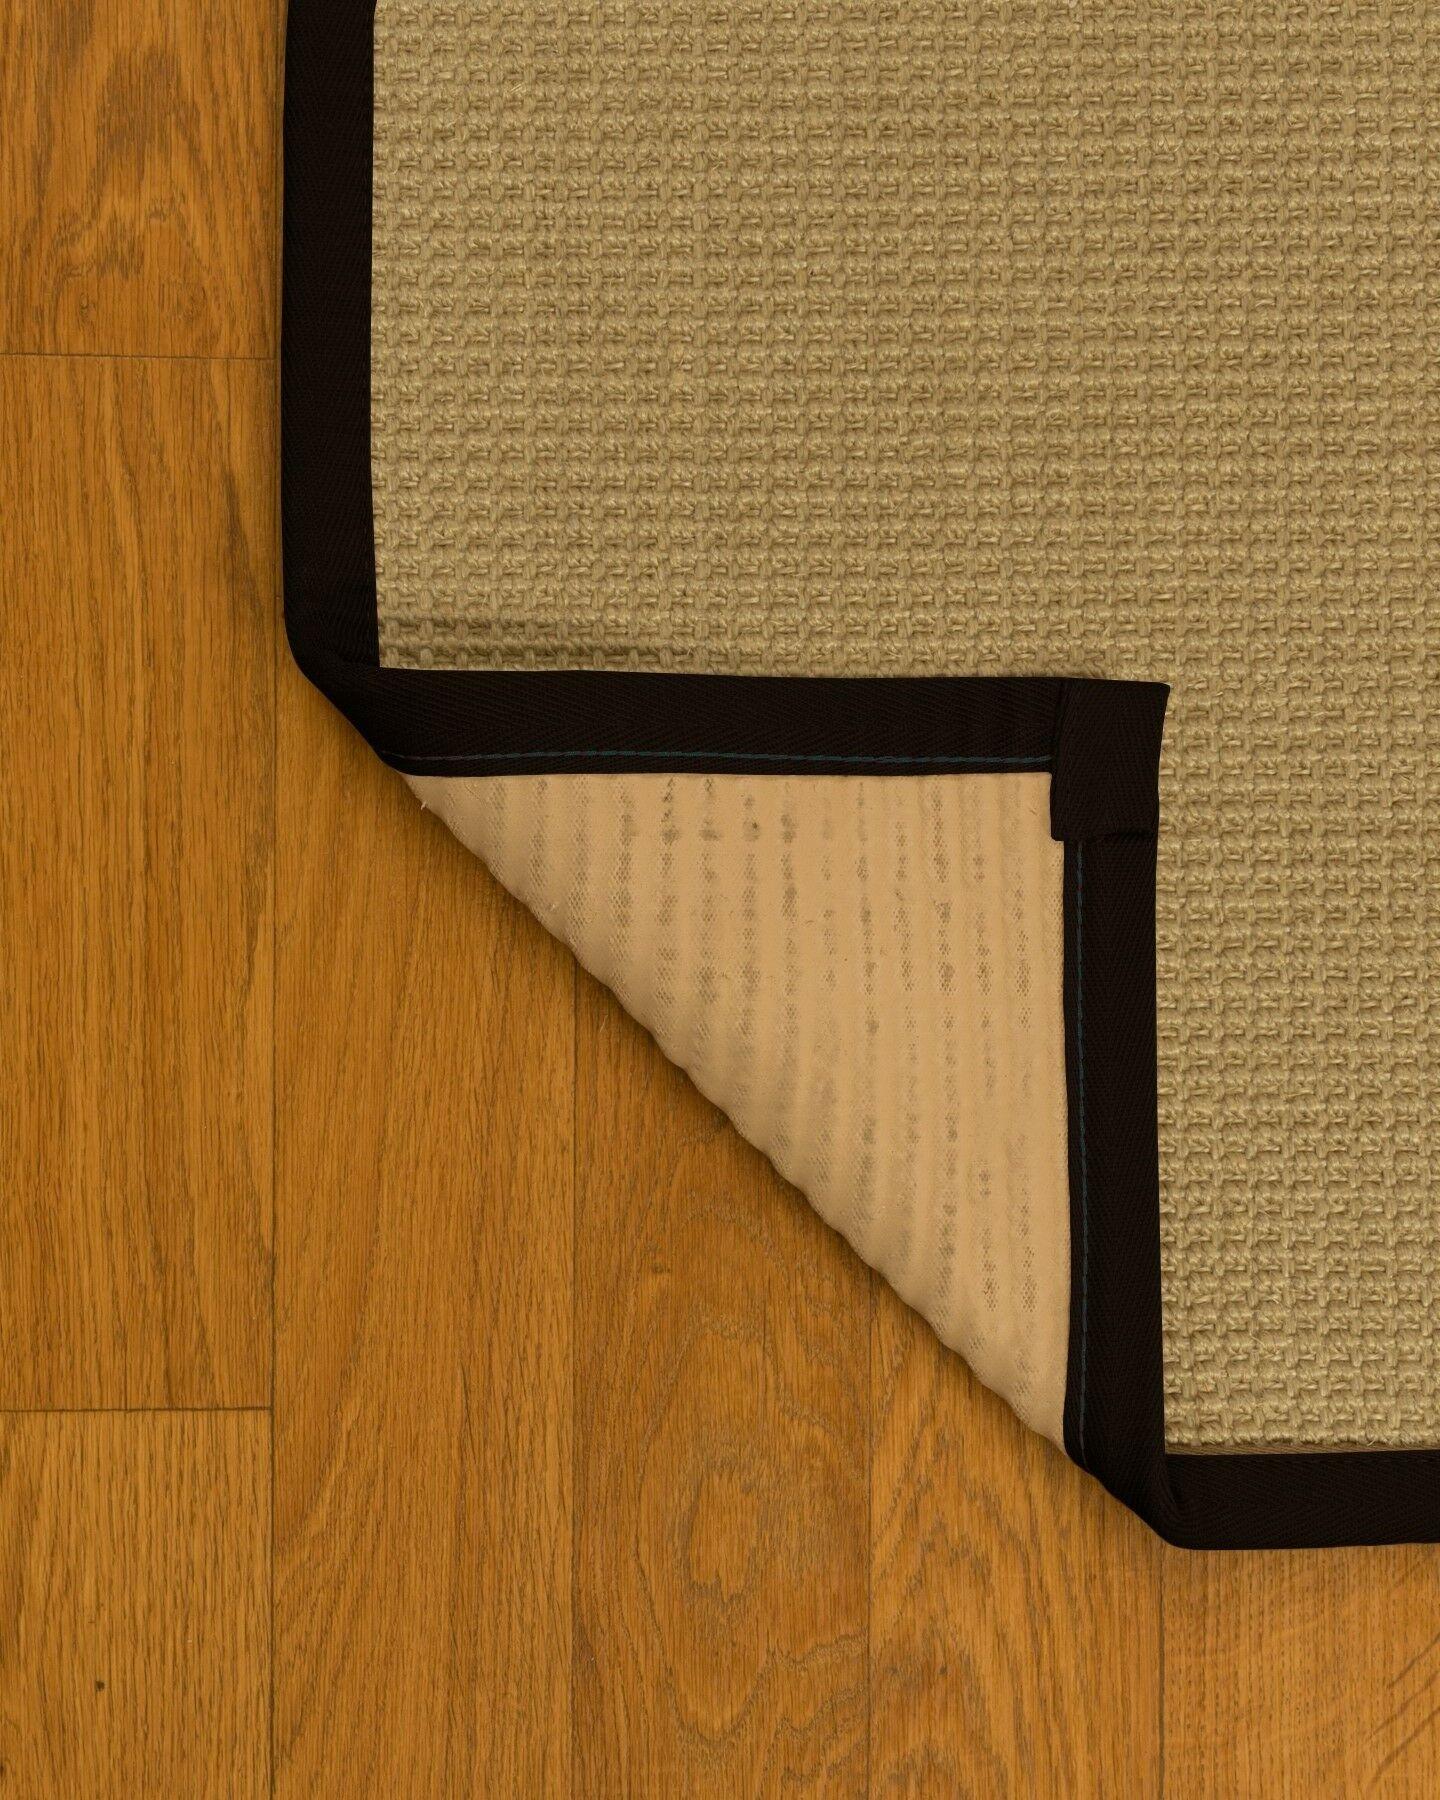 Jacobs Natural Fiber Sisal Hand-Woven Beige Area Rug Rug Size: Rectangle 9' x 12'